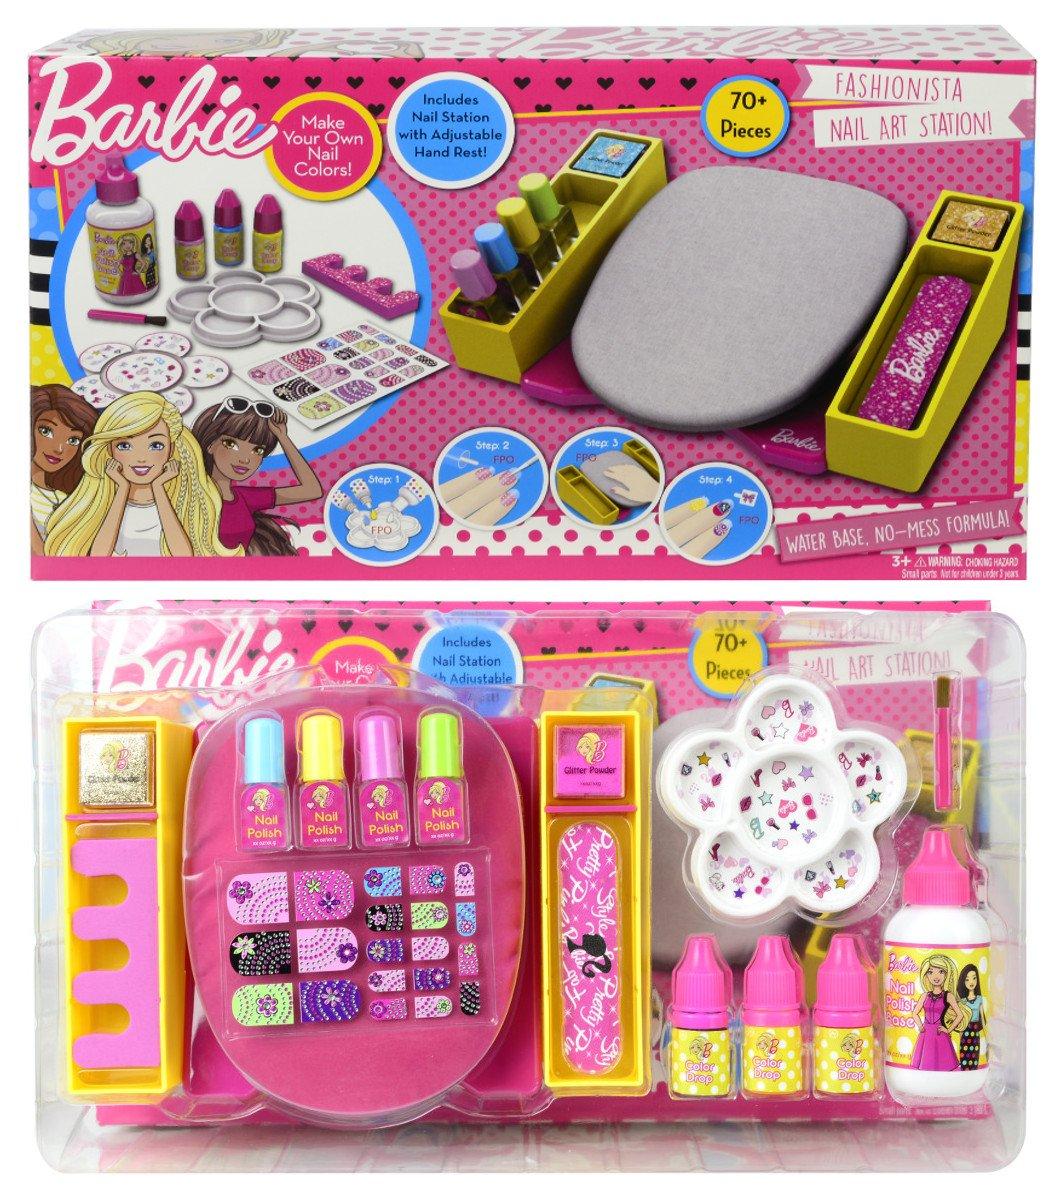 Barbie Nail Art Station 9709410